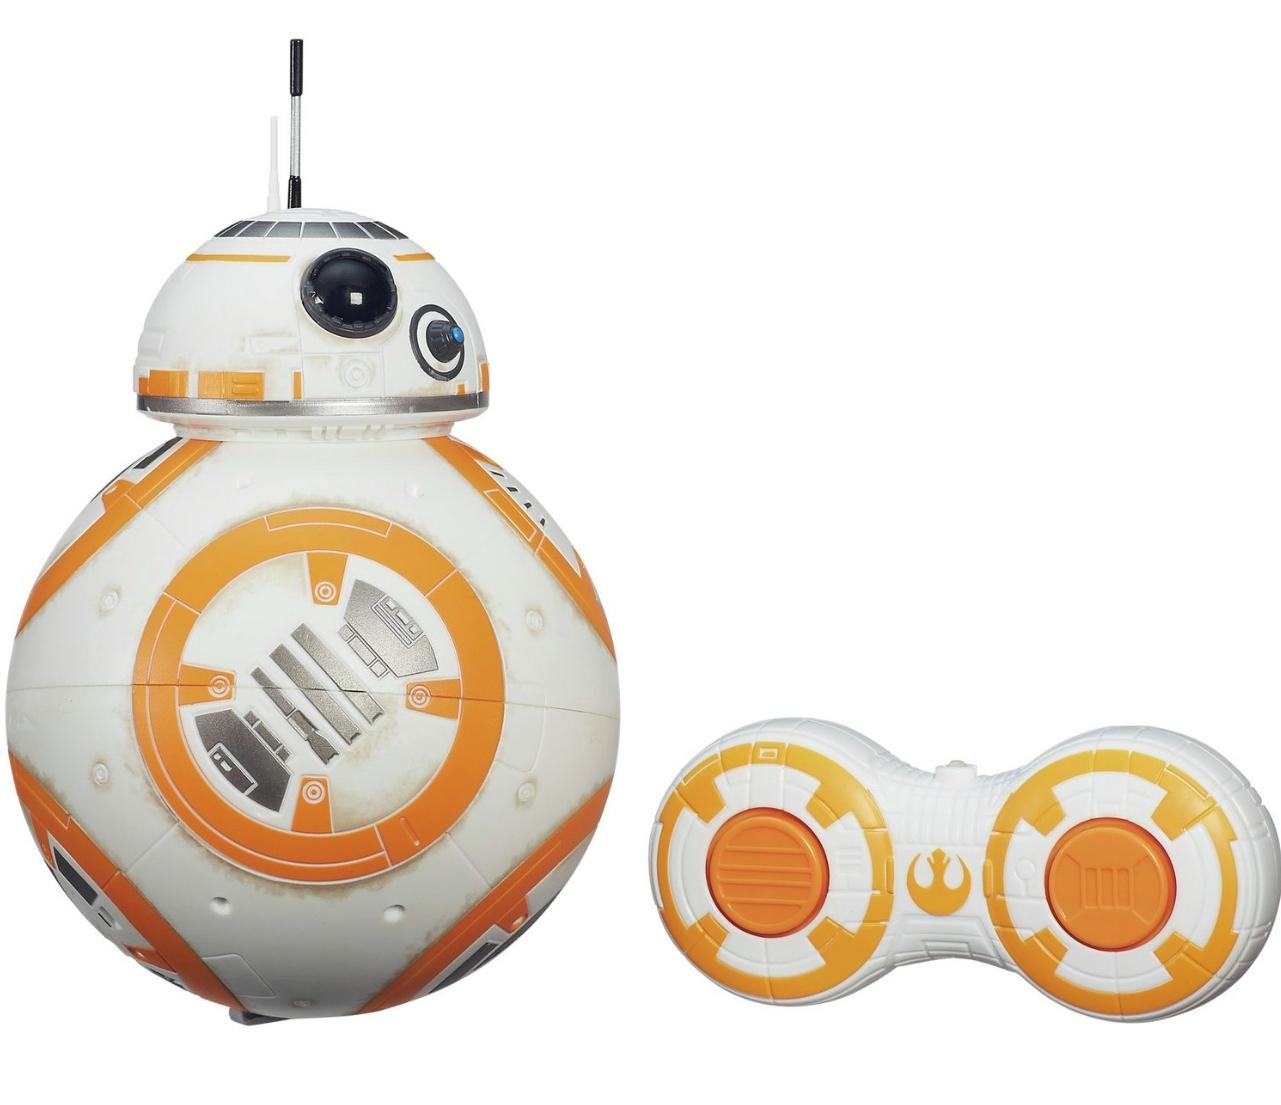 Star Wars: The Force Awakens RC BB8 £33.99 Argos